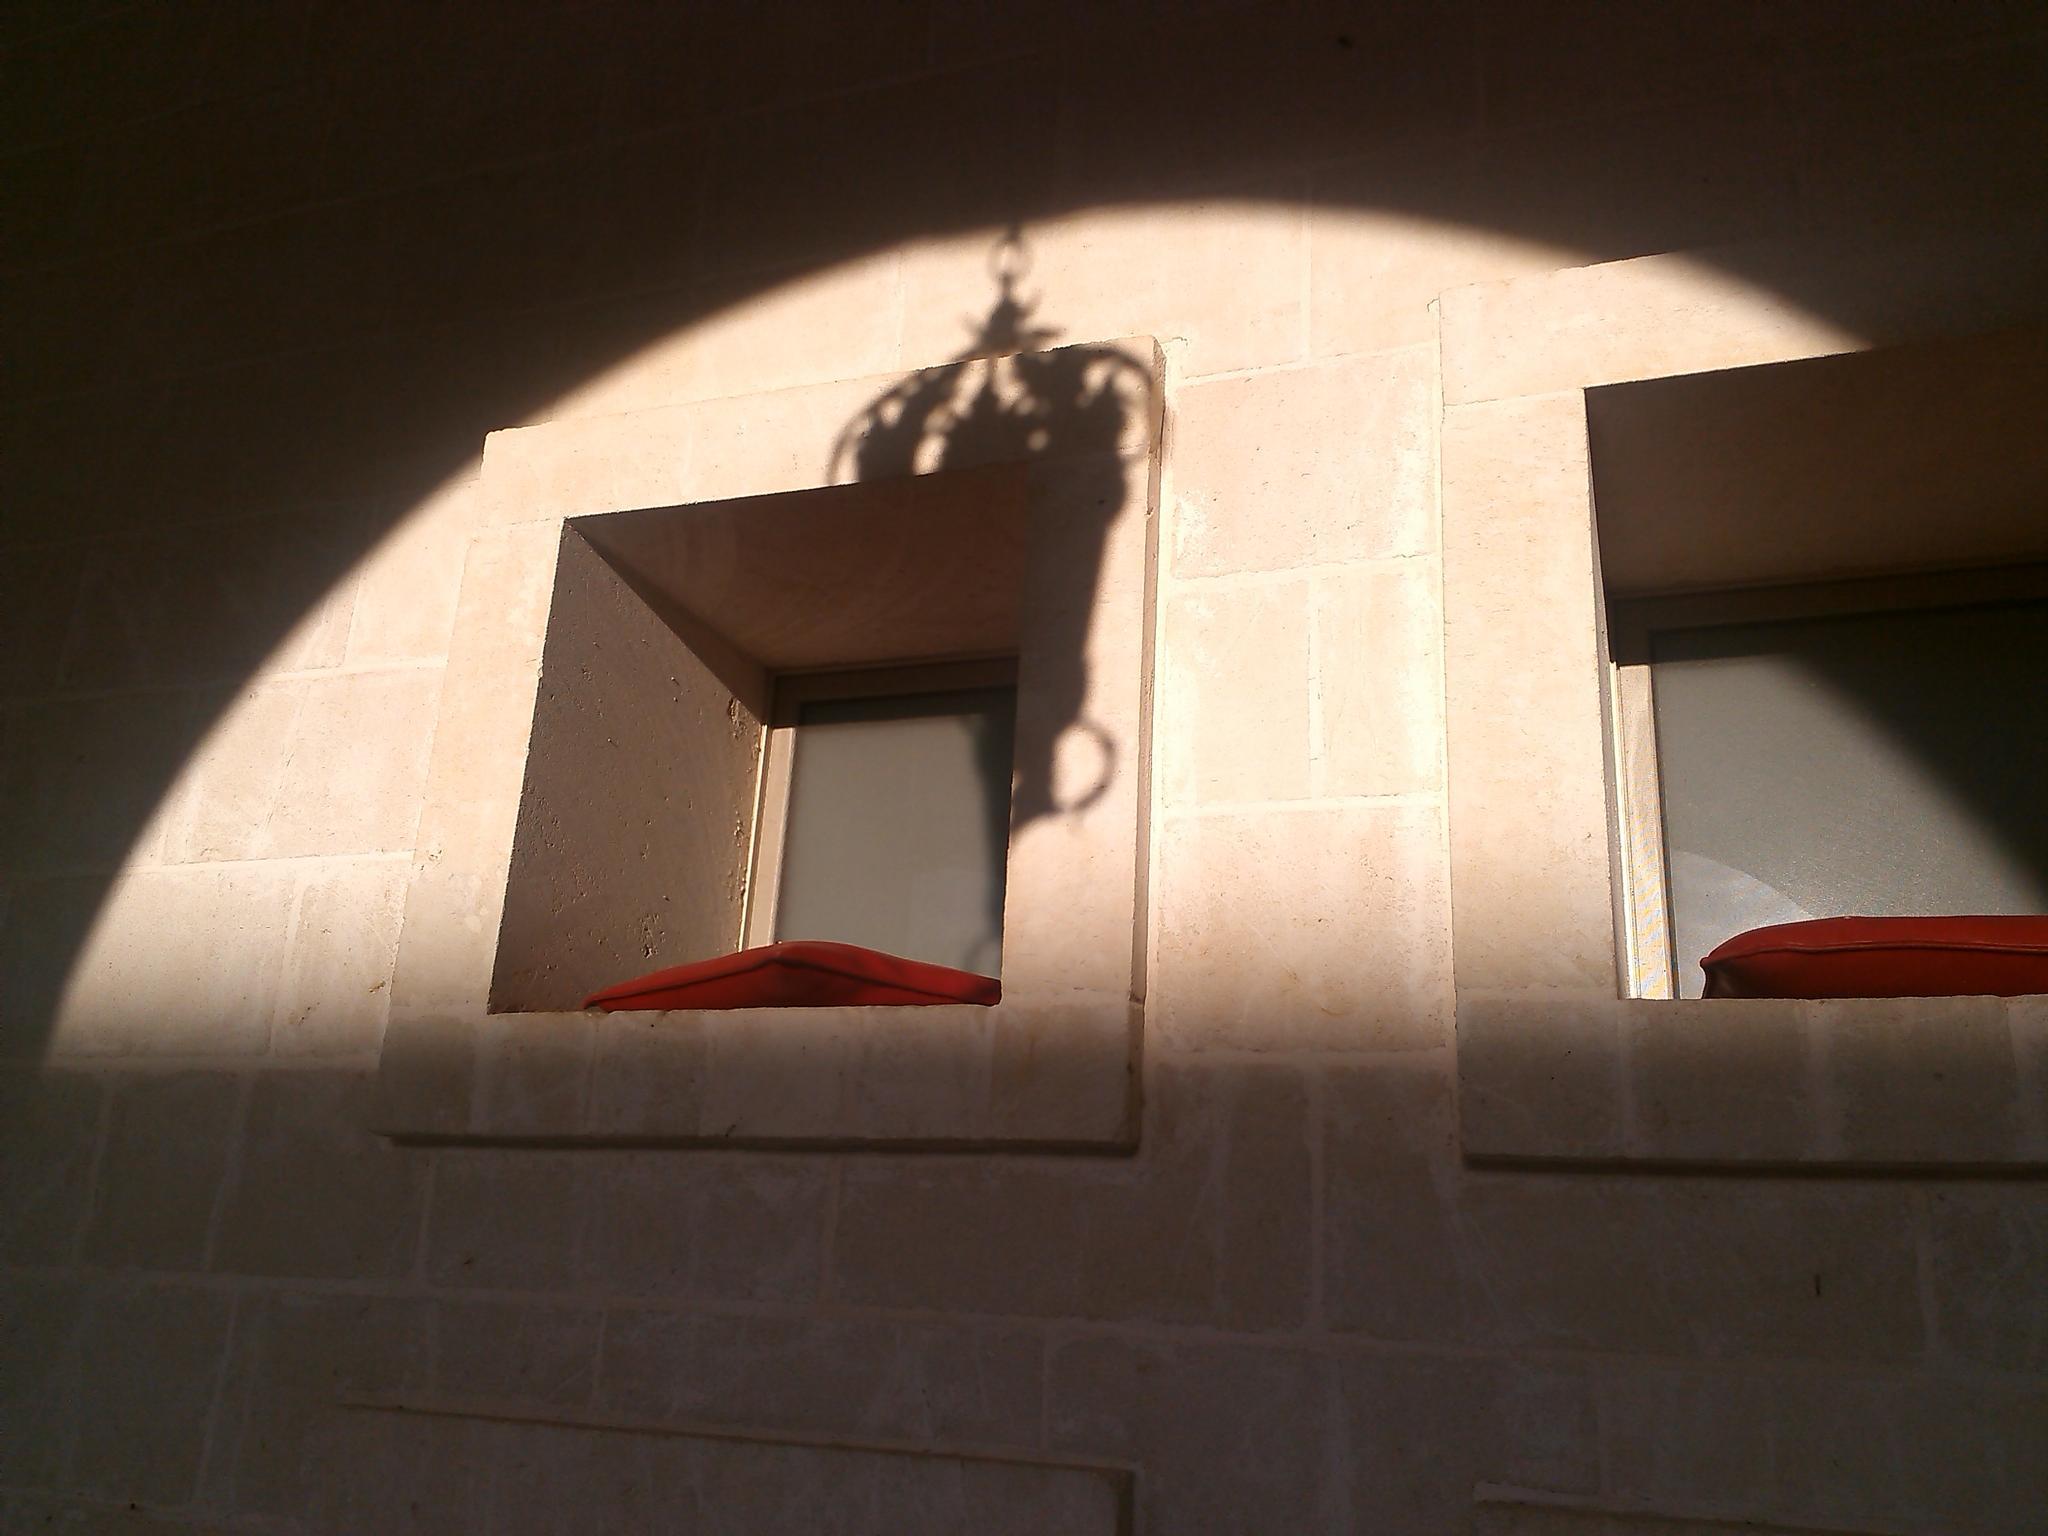 Shadow over windows by Renato Nacci